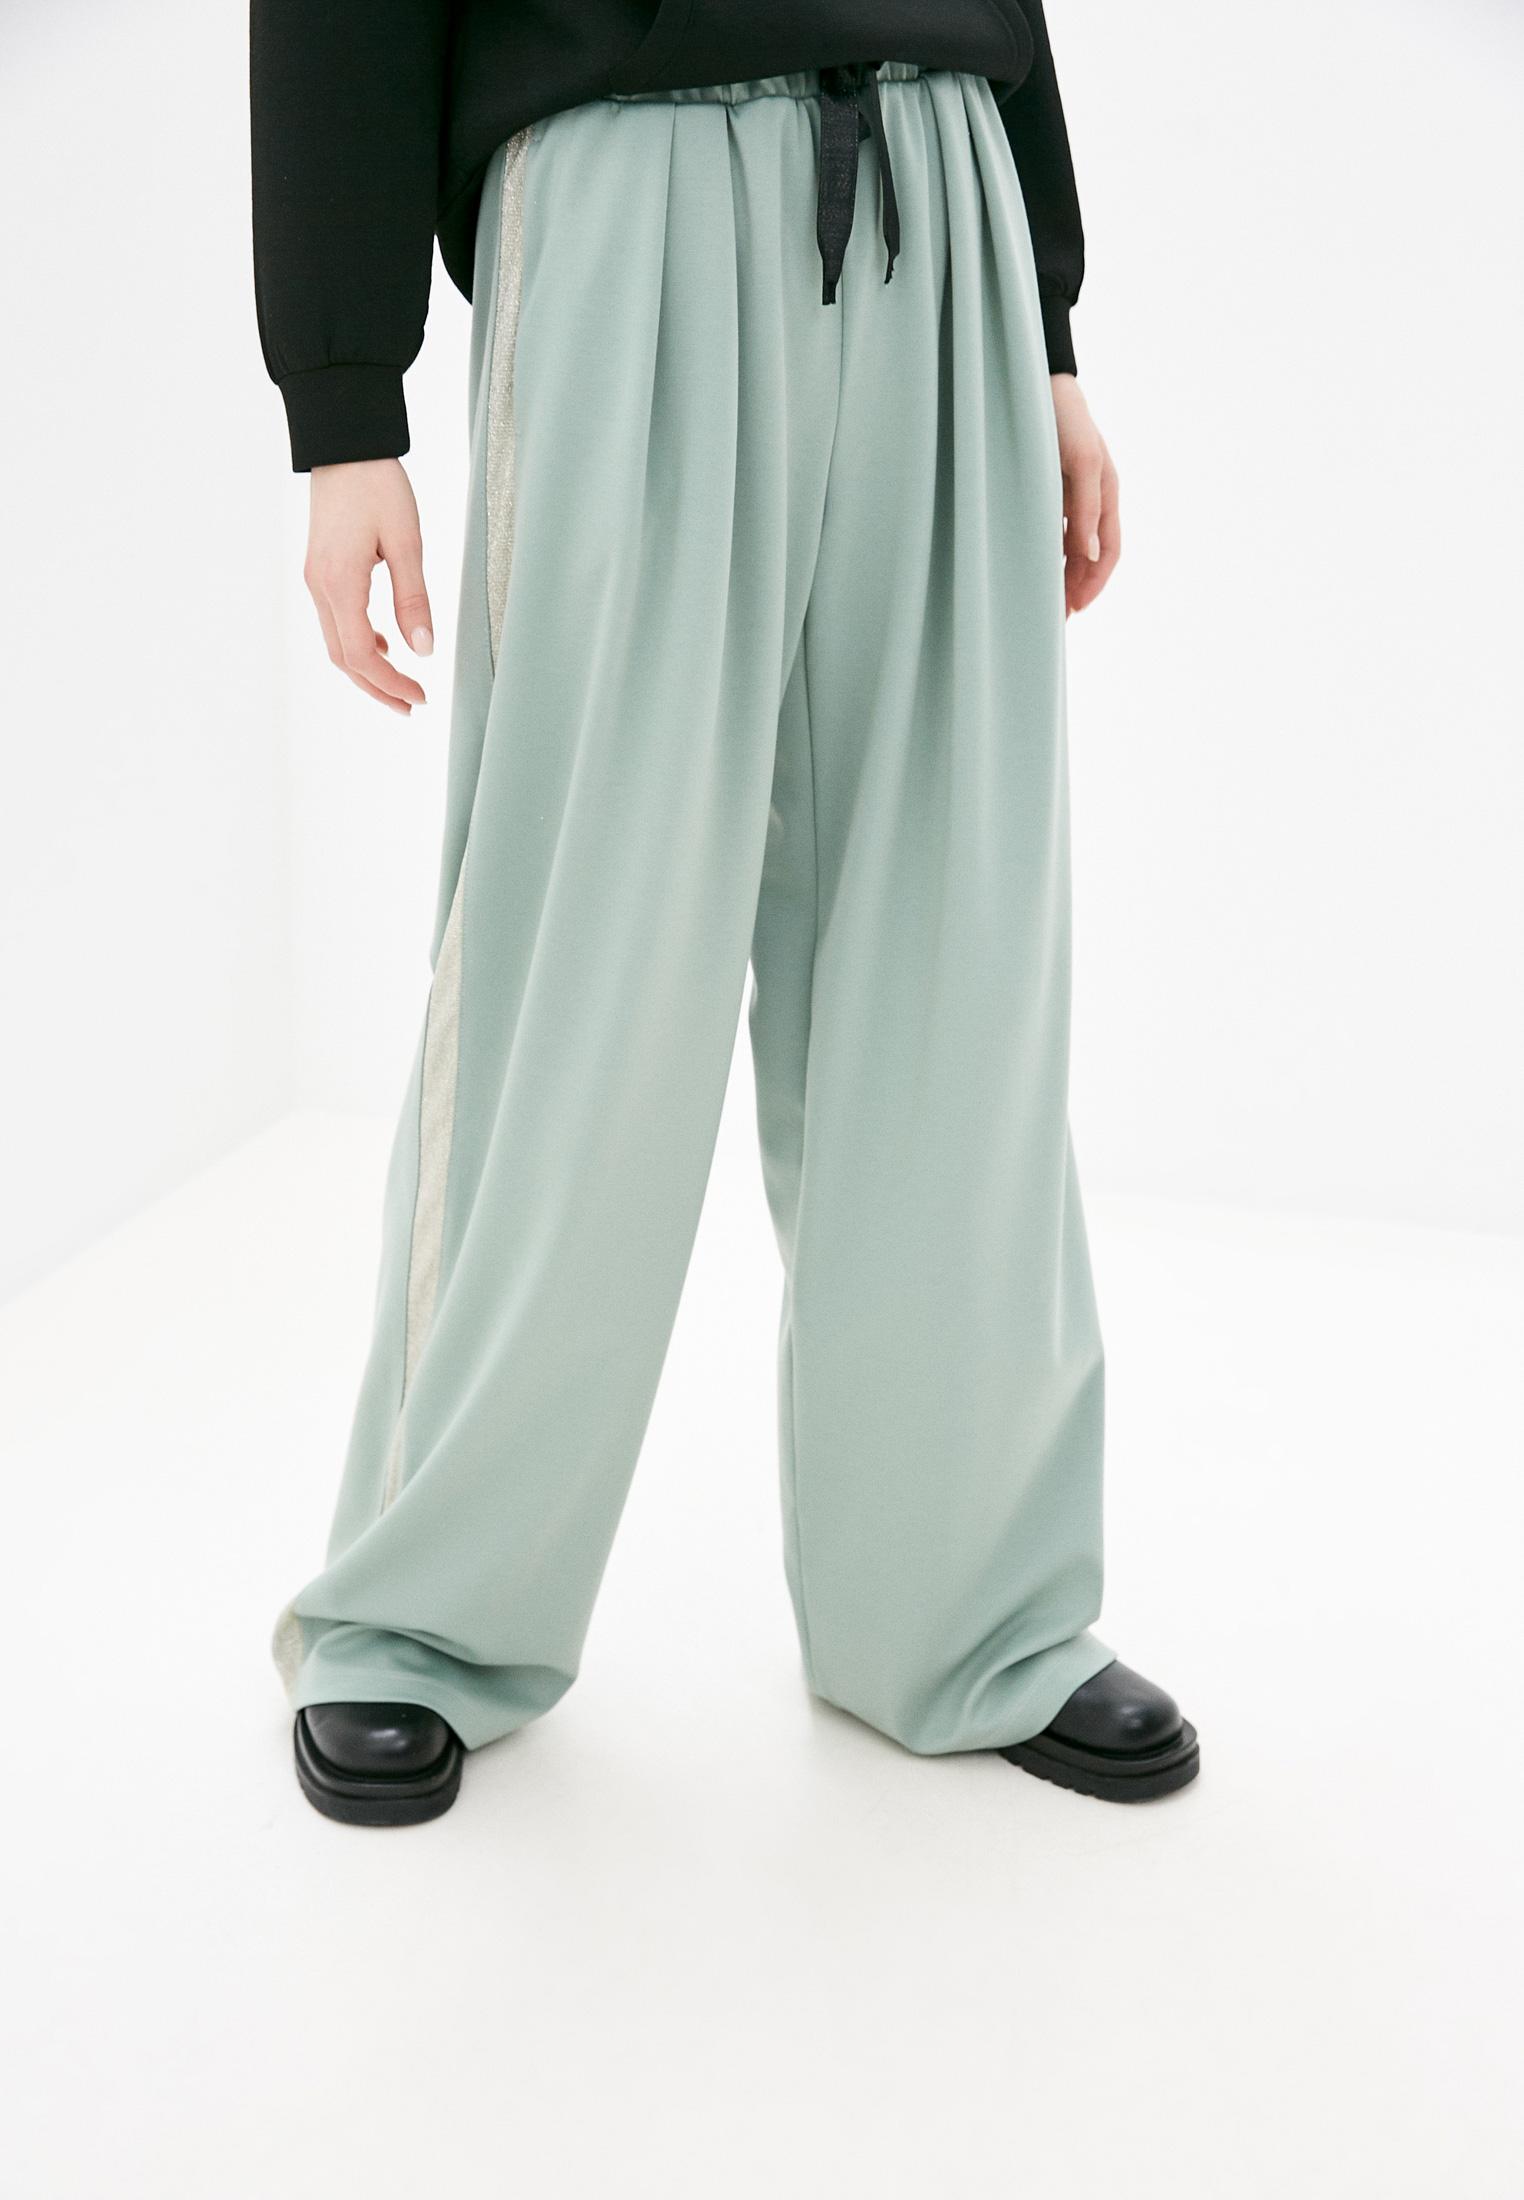 Женские брюки Nataliy Beate Брюки мод 509 а: изображение 1